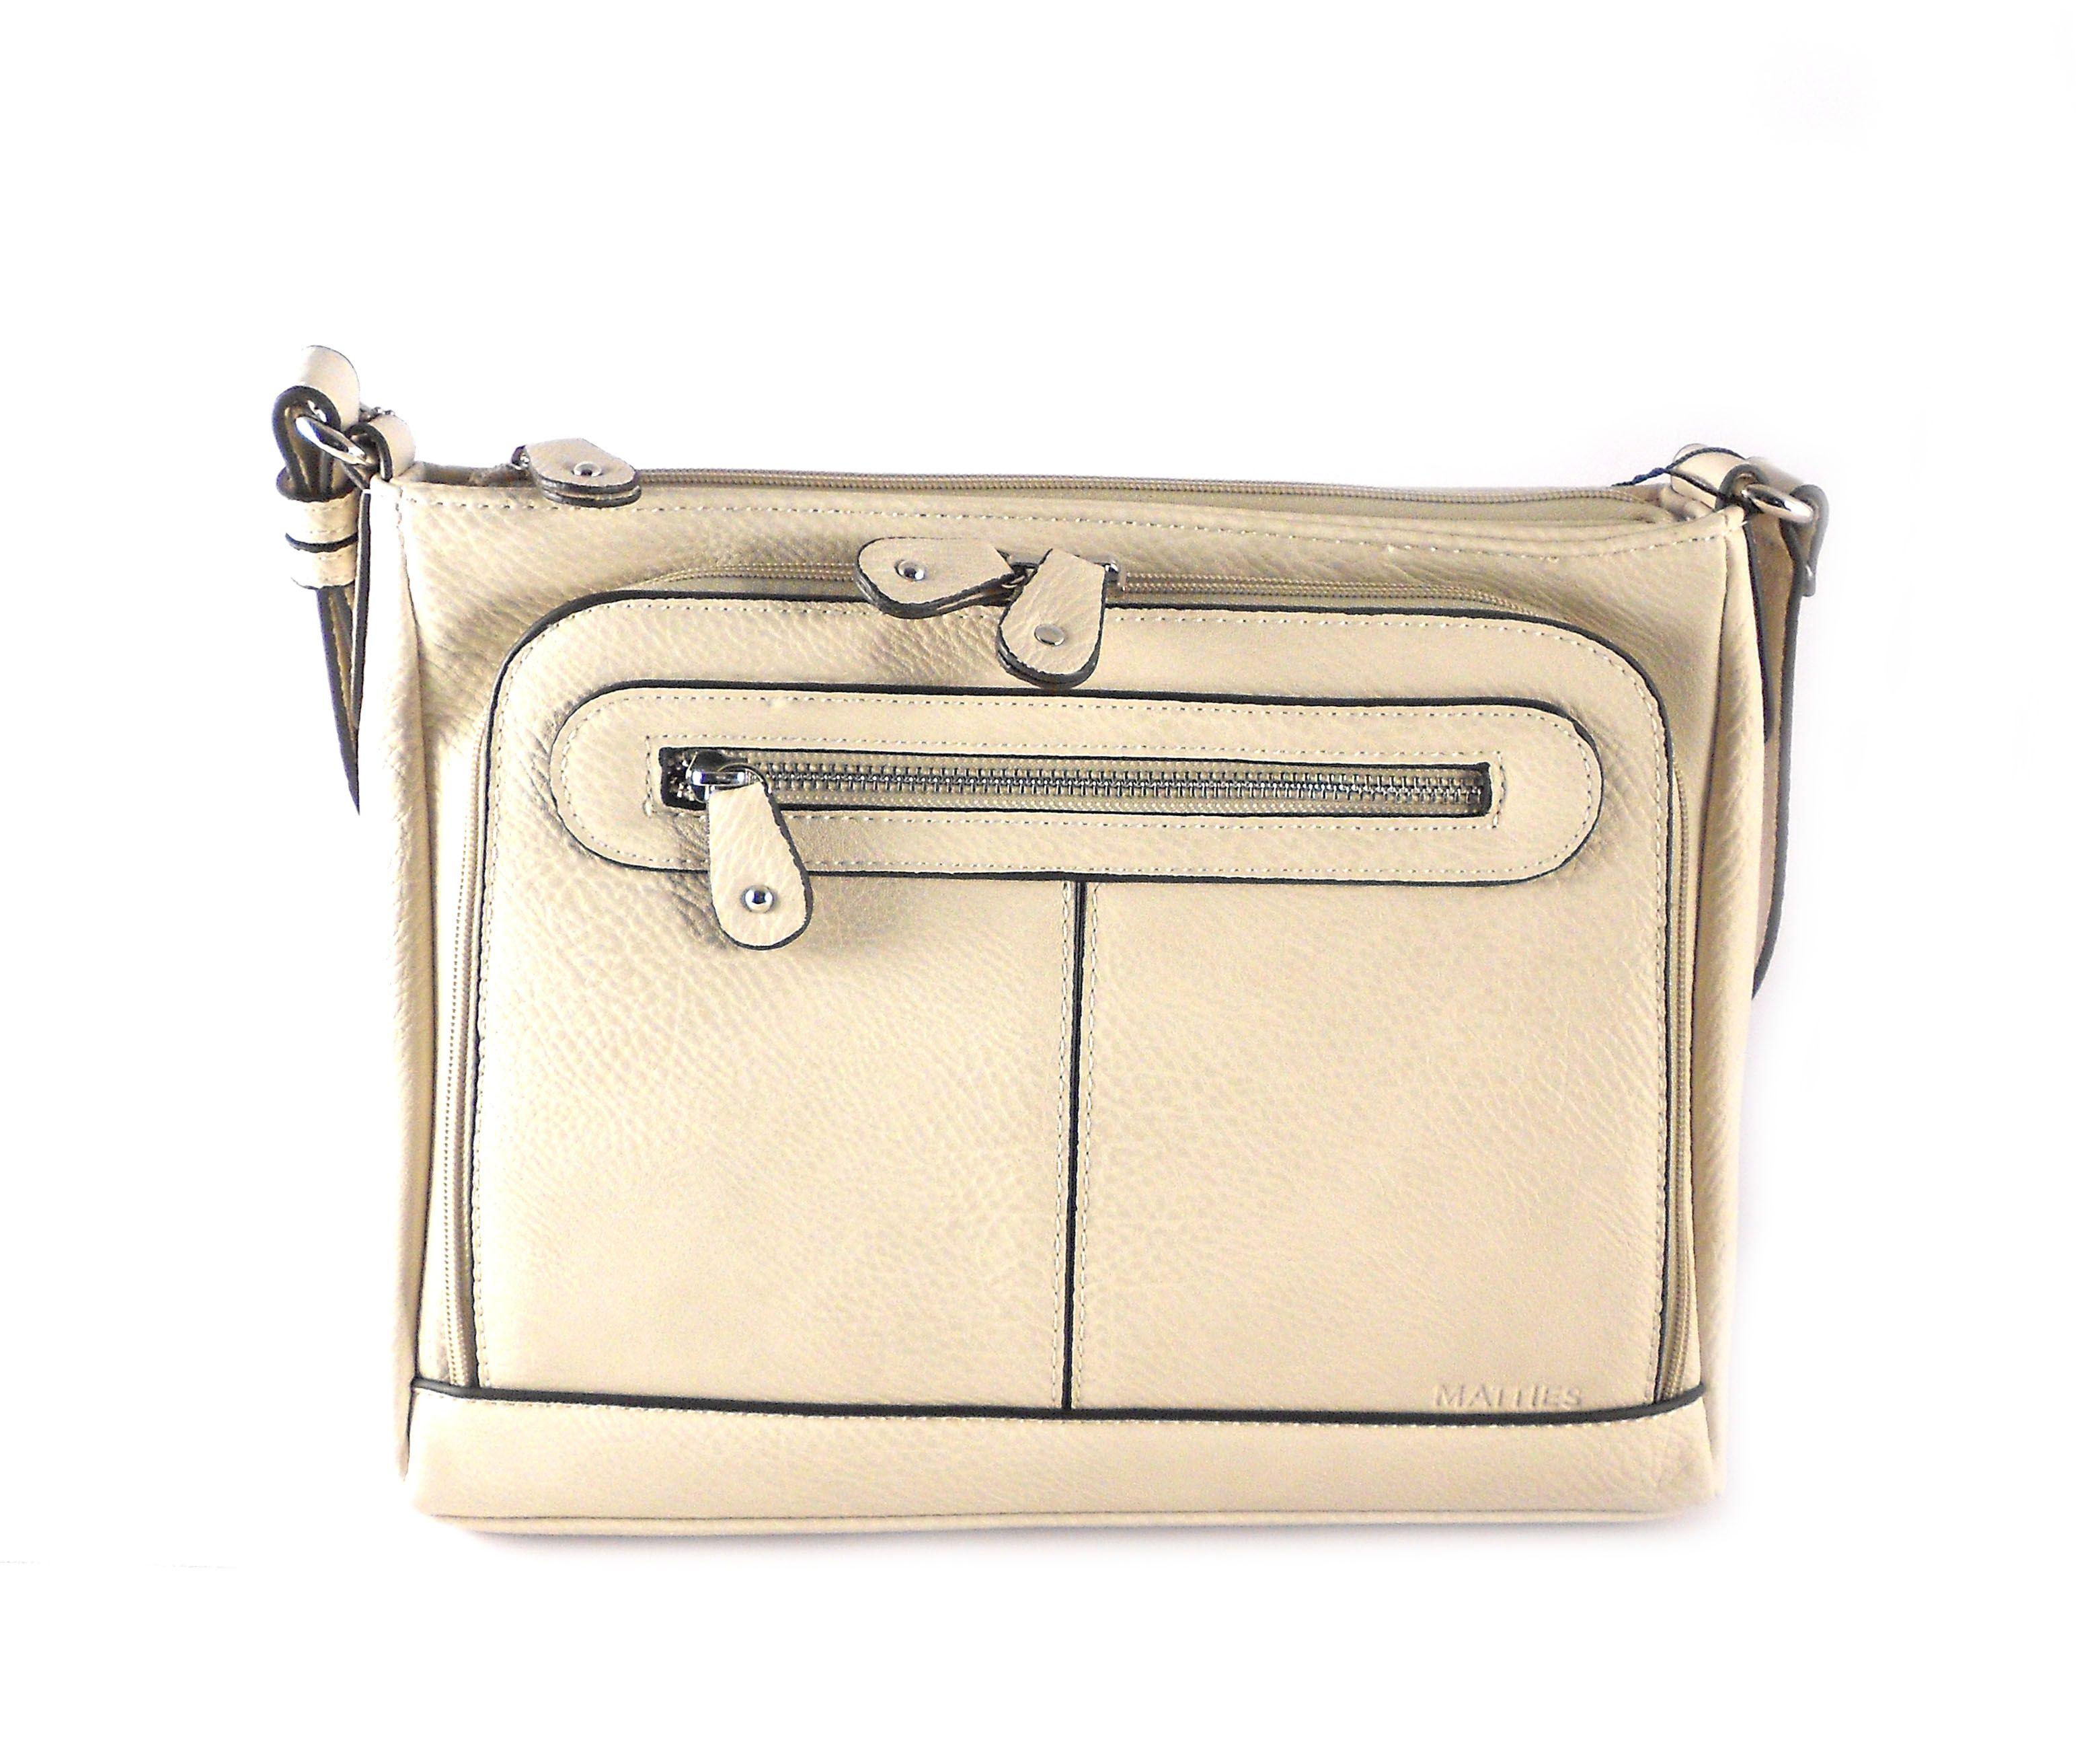 57139a071e2 Bandolera mediana para mujer Matties Bags serie Classic